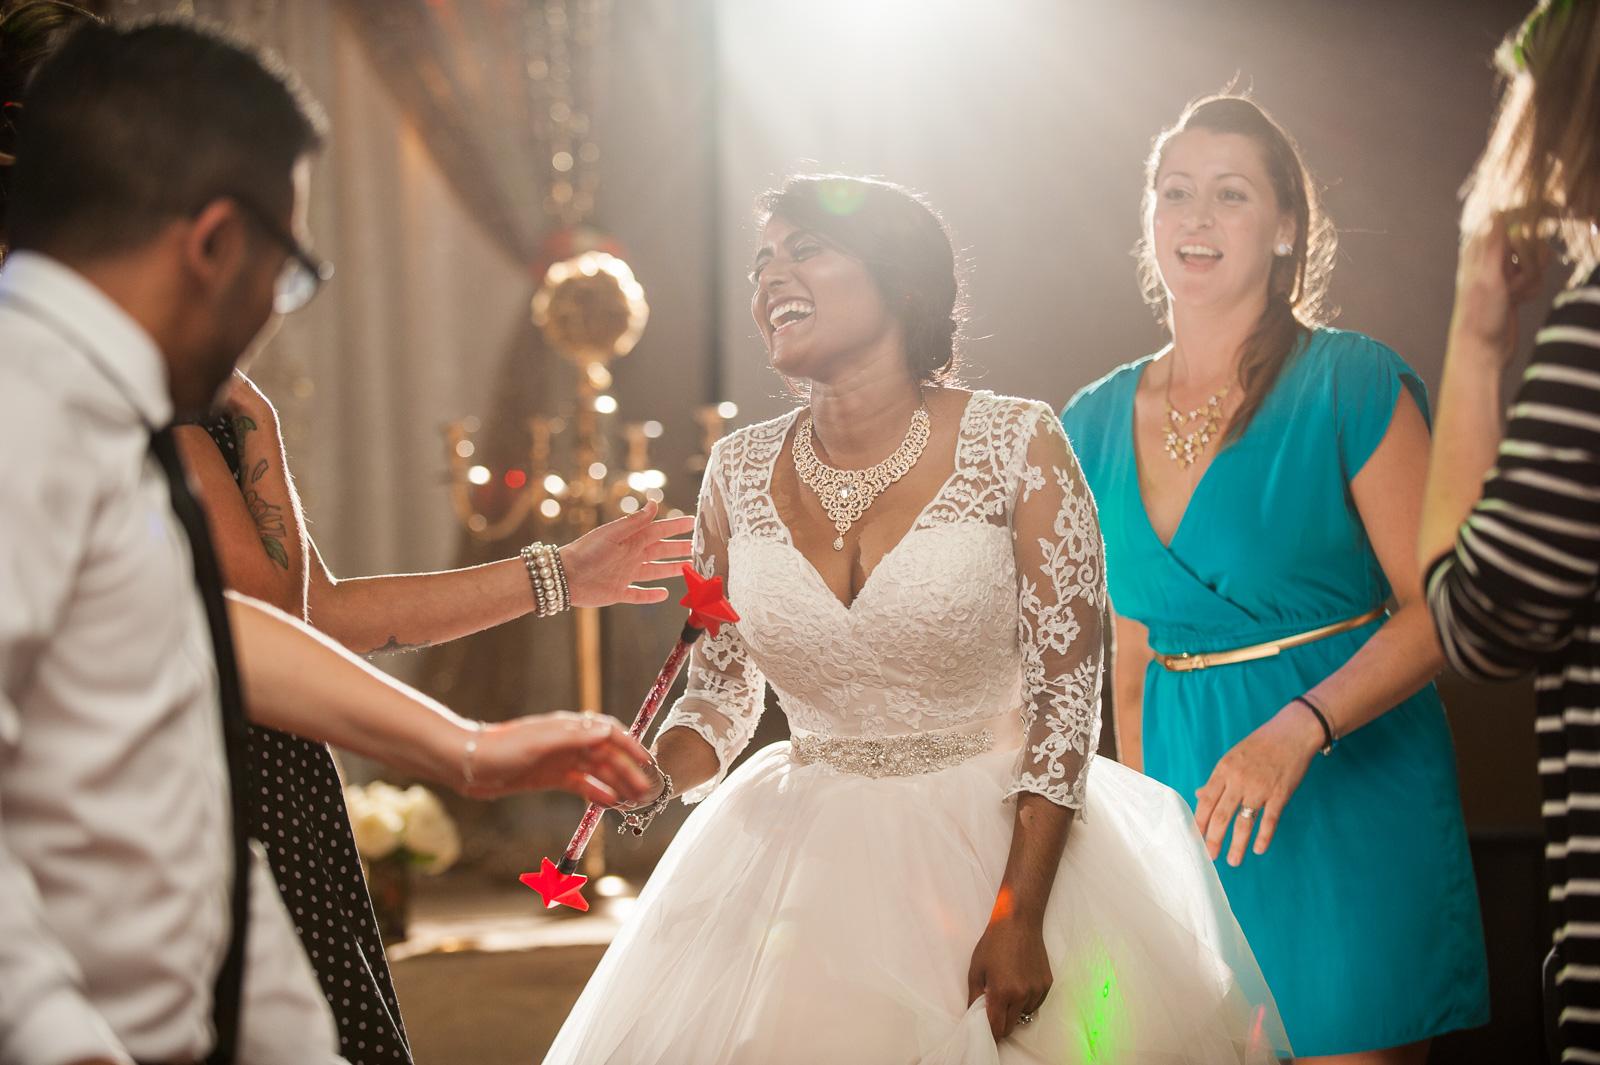 bc-wedding-photographers-paradise-banquet-hall-wedding-34.jpg